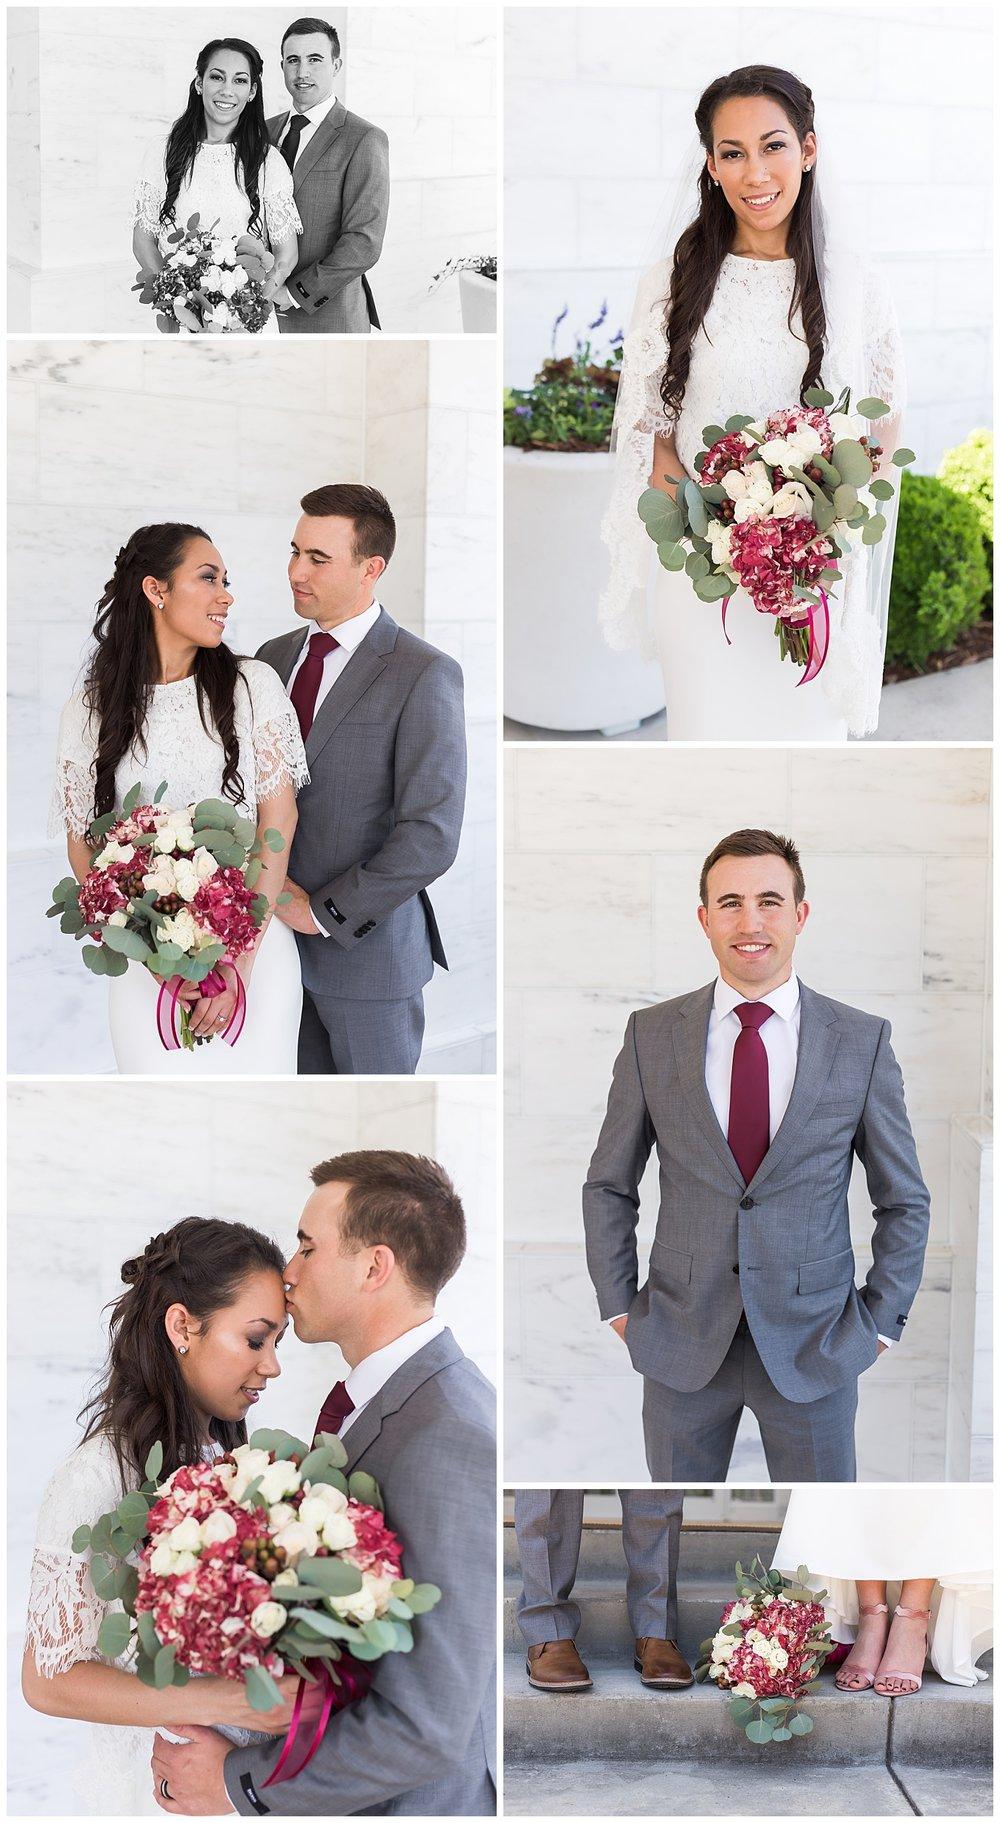 wedding photos birmingham alabama temple lauren beesley photography